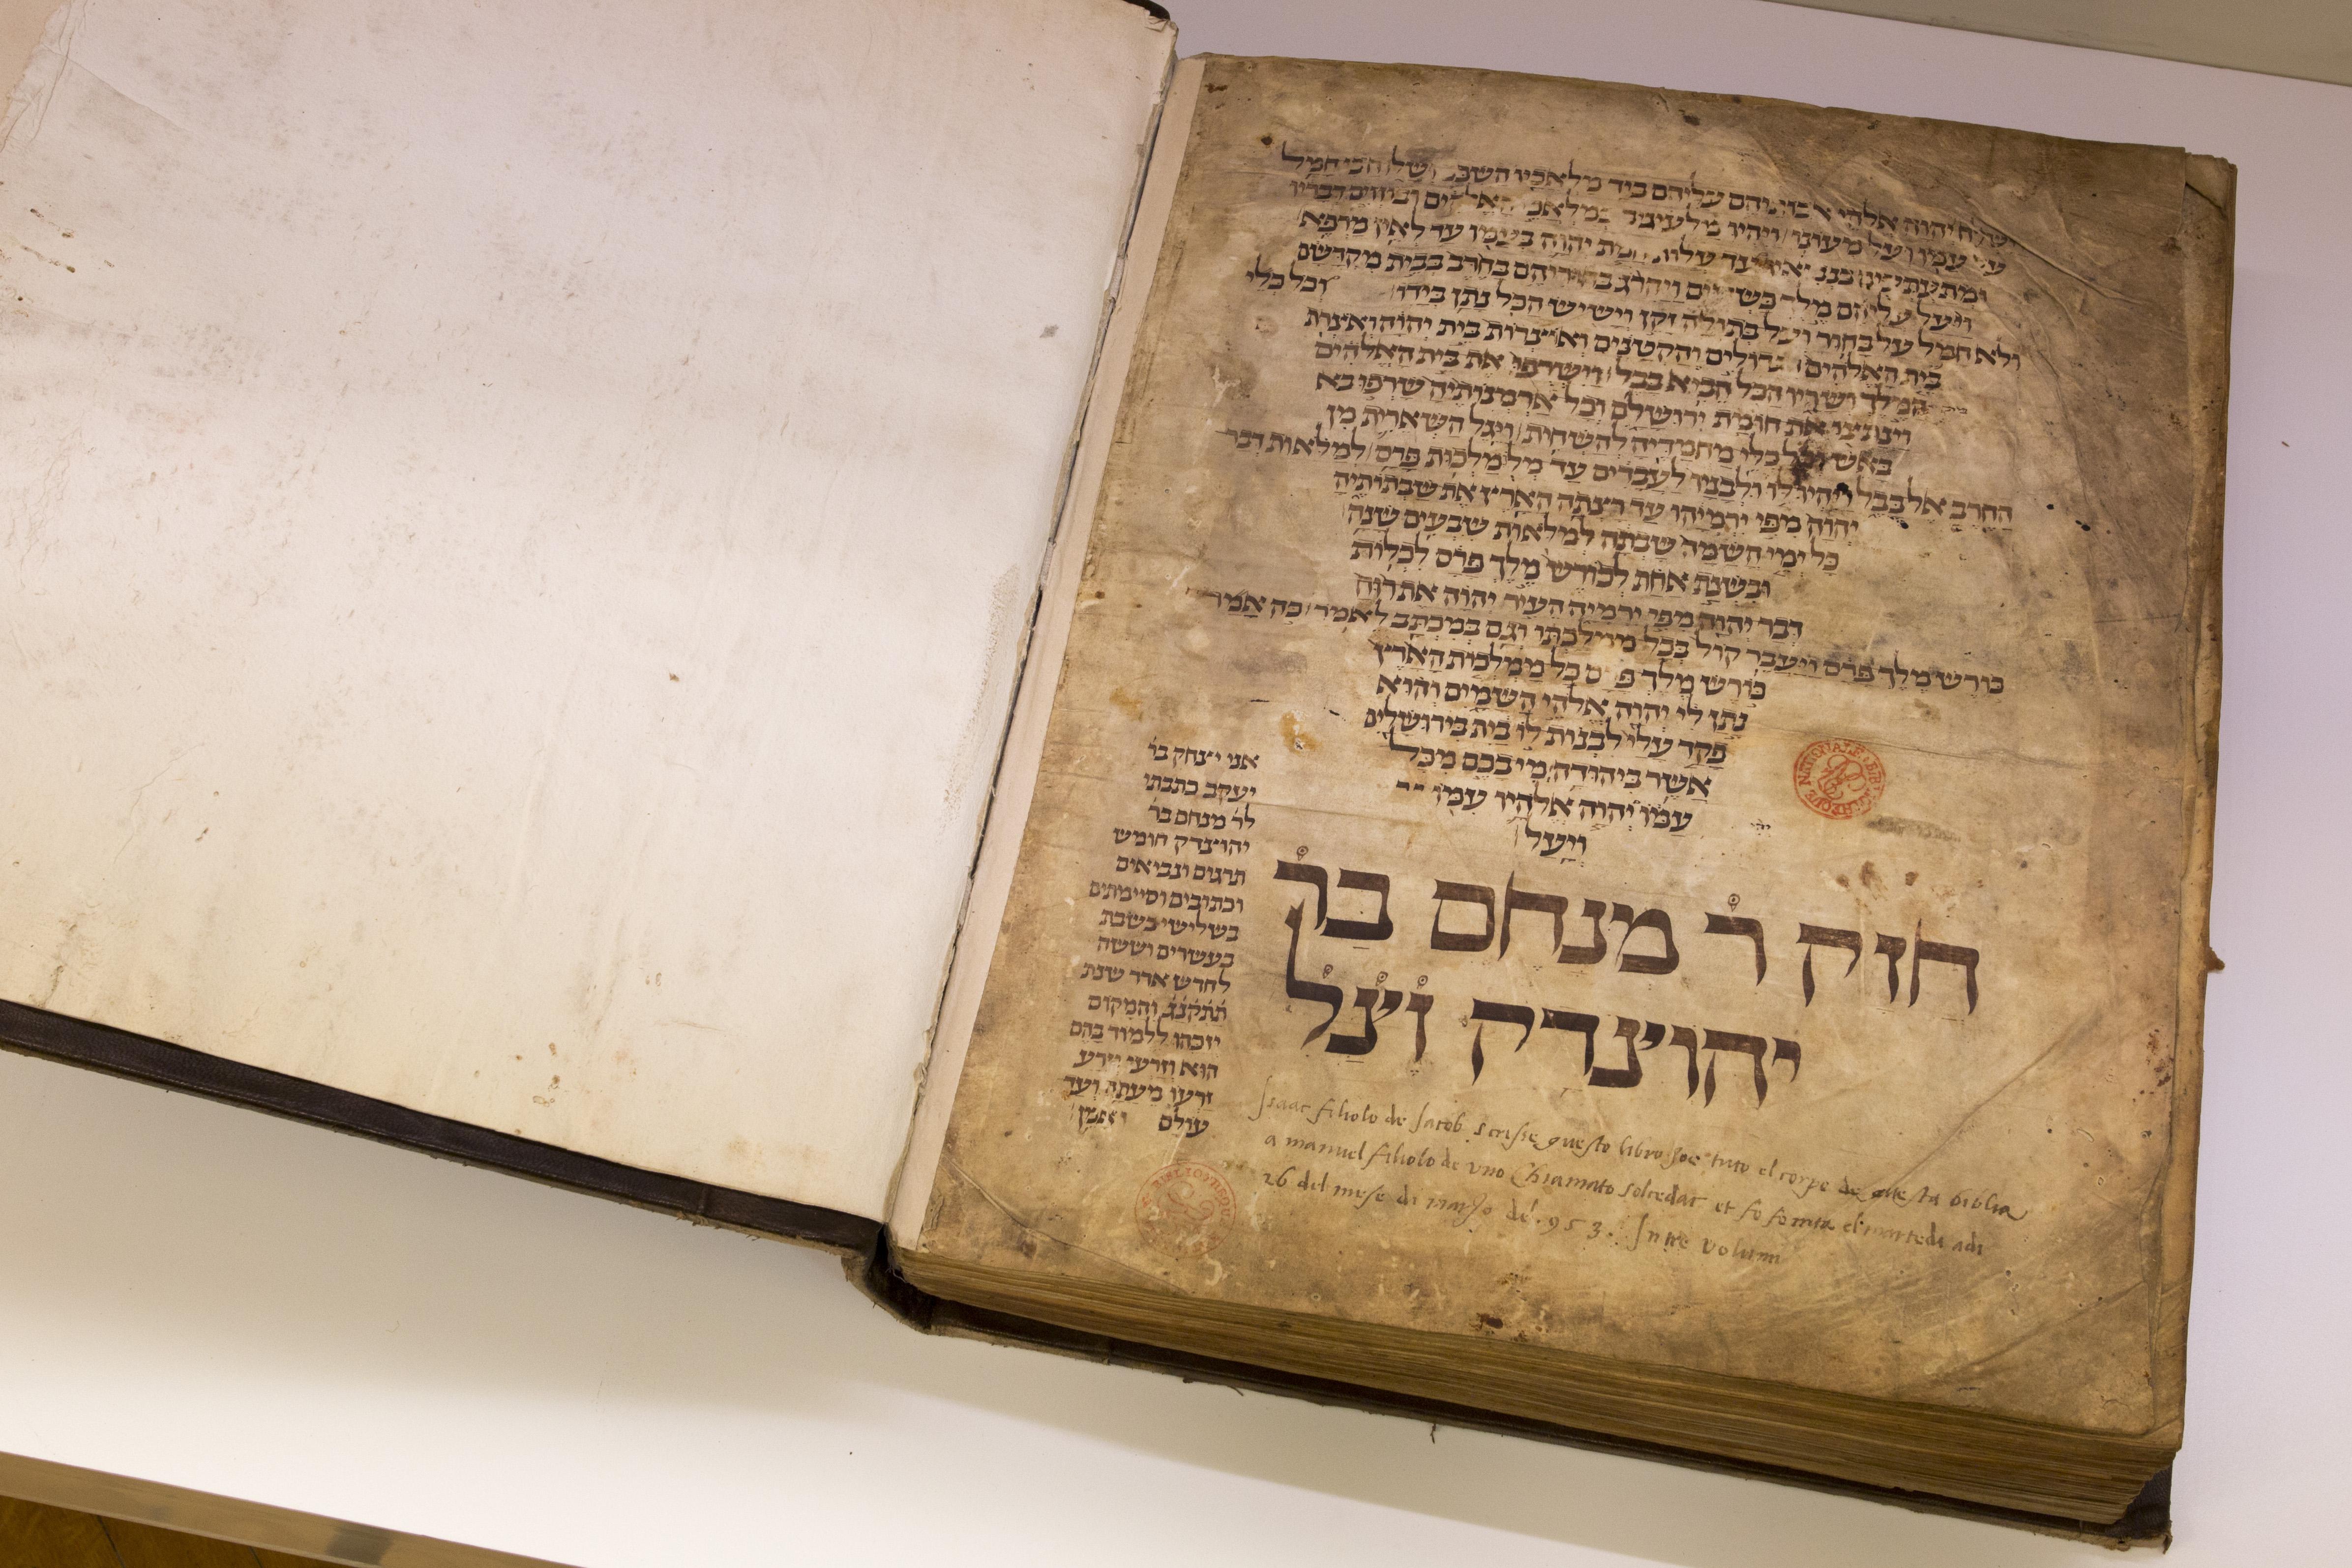 Biblioteca Universitaria di Bologna, Ebraici; ms. 2208